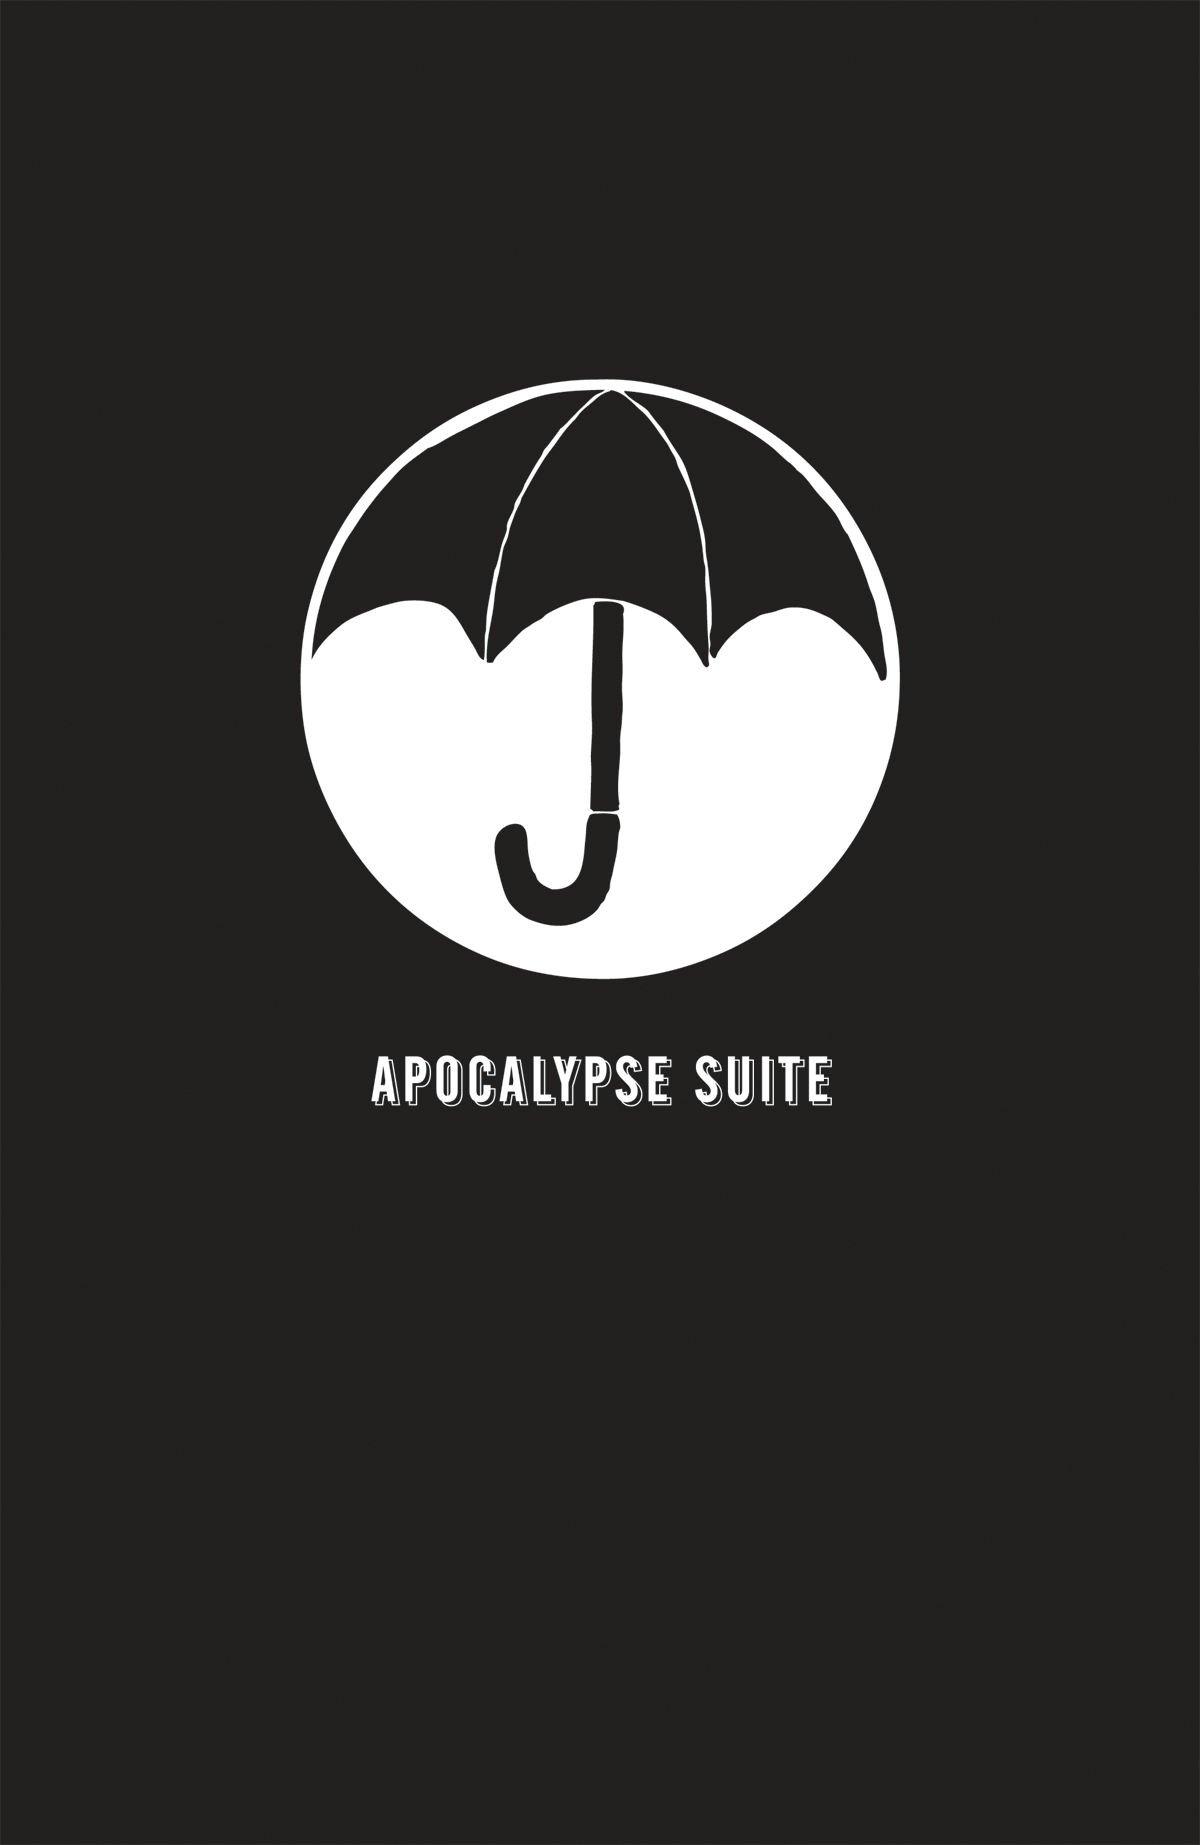 [8+] The Umbrella Academy Wallpapers on WallpaperSafari